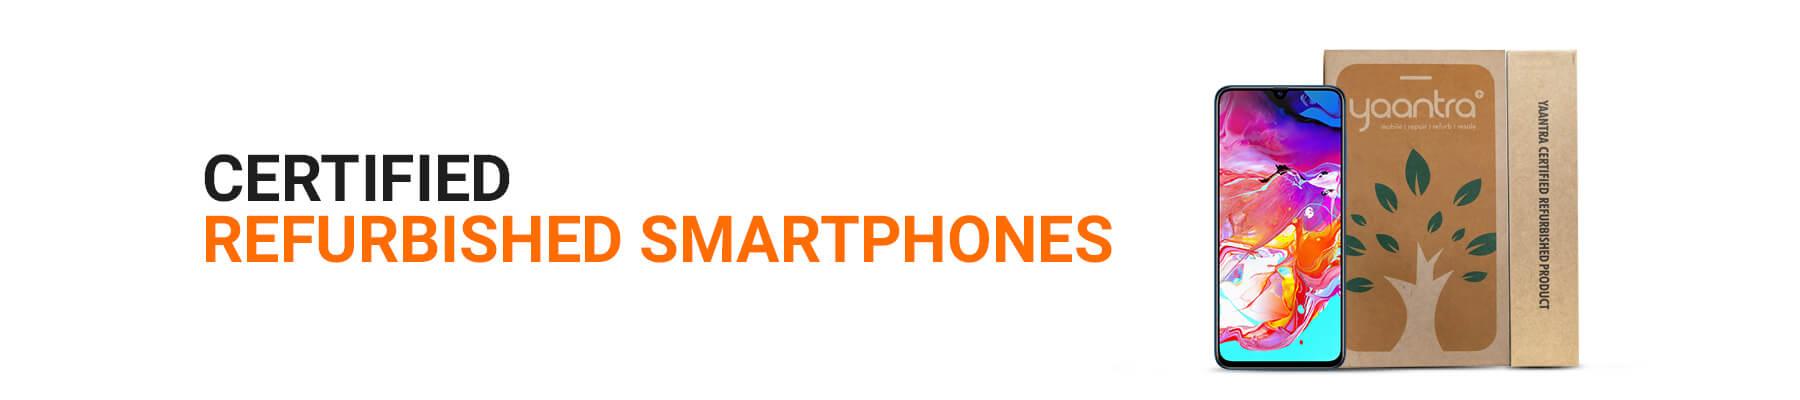 Yaantra Refurbished Smartphone